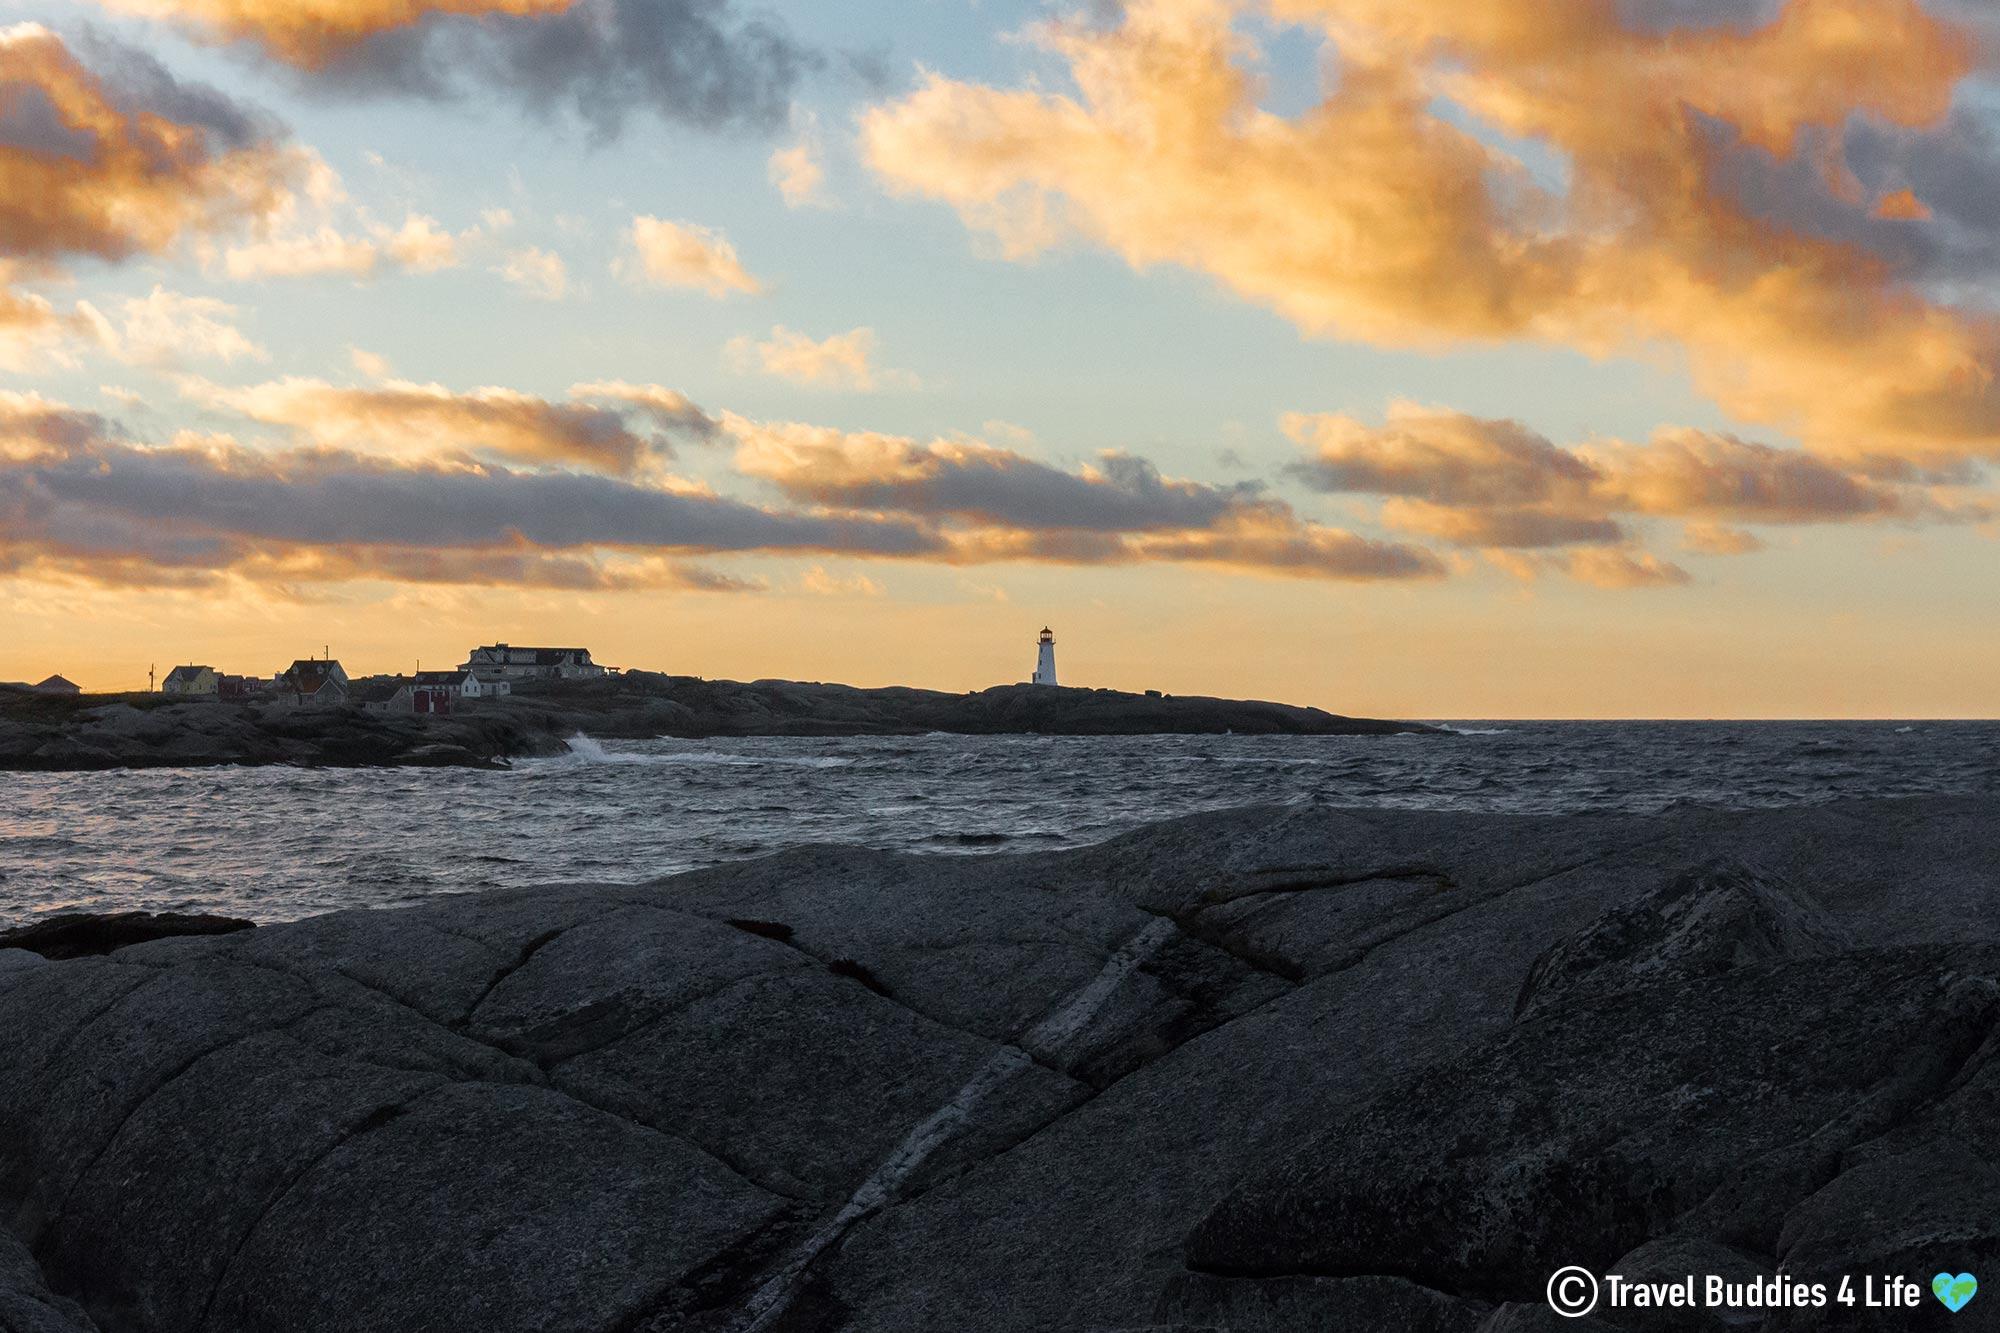 Peggy's Cove Lighthouse Under The Orange Glow Of The Sunset, Halifax, Nova Scotia